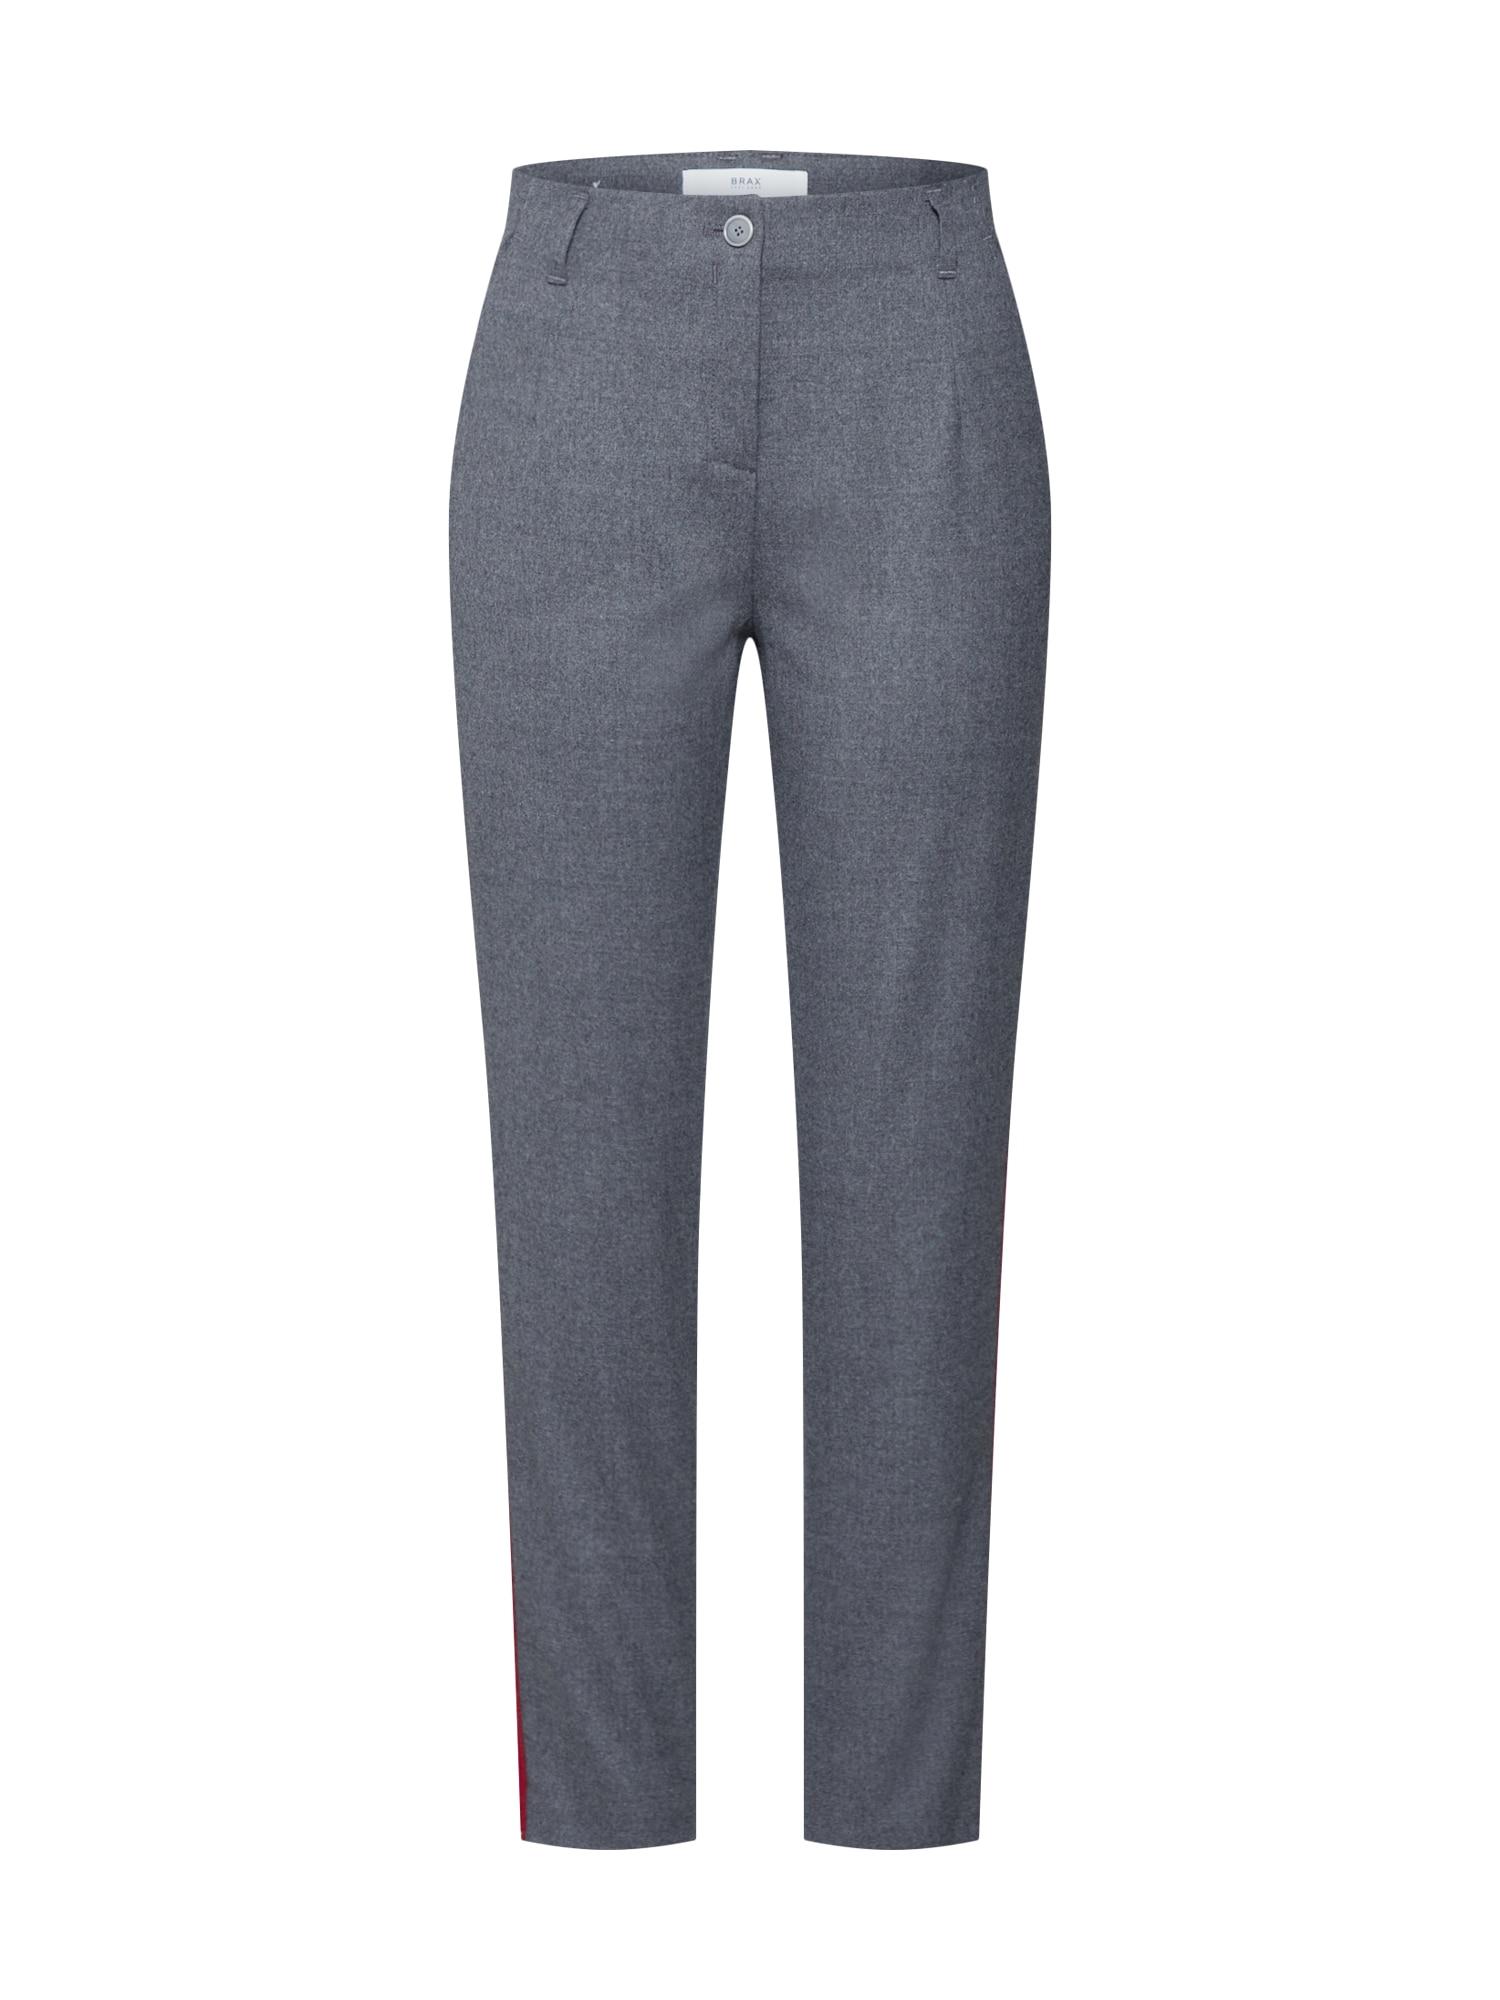 BRAX Chino stiliaus kelnės 'Mel S' pilka